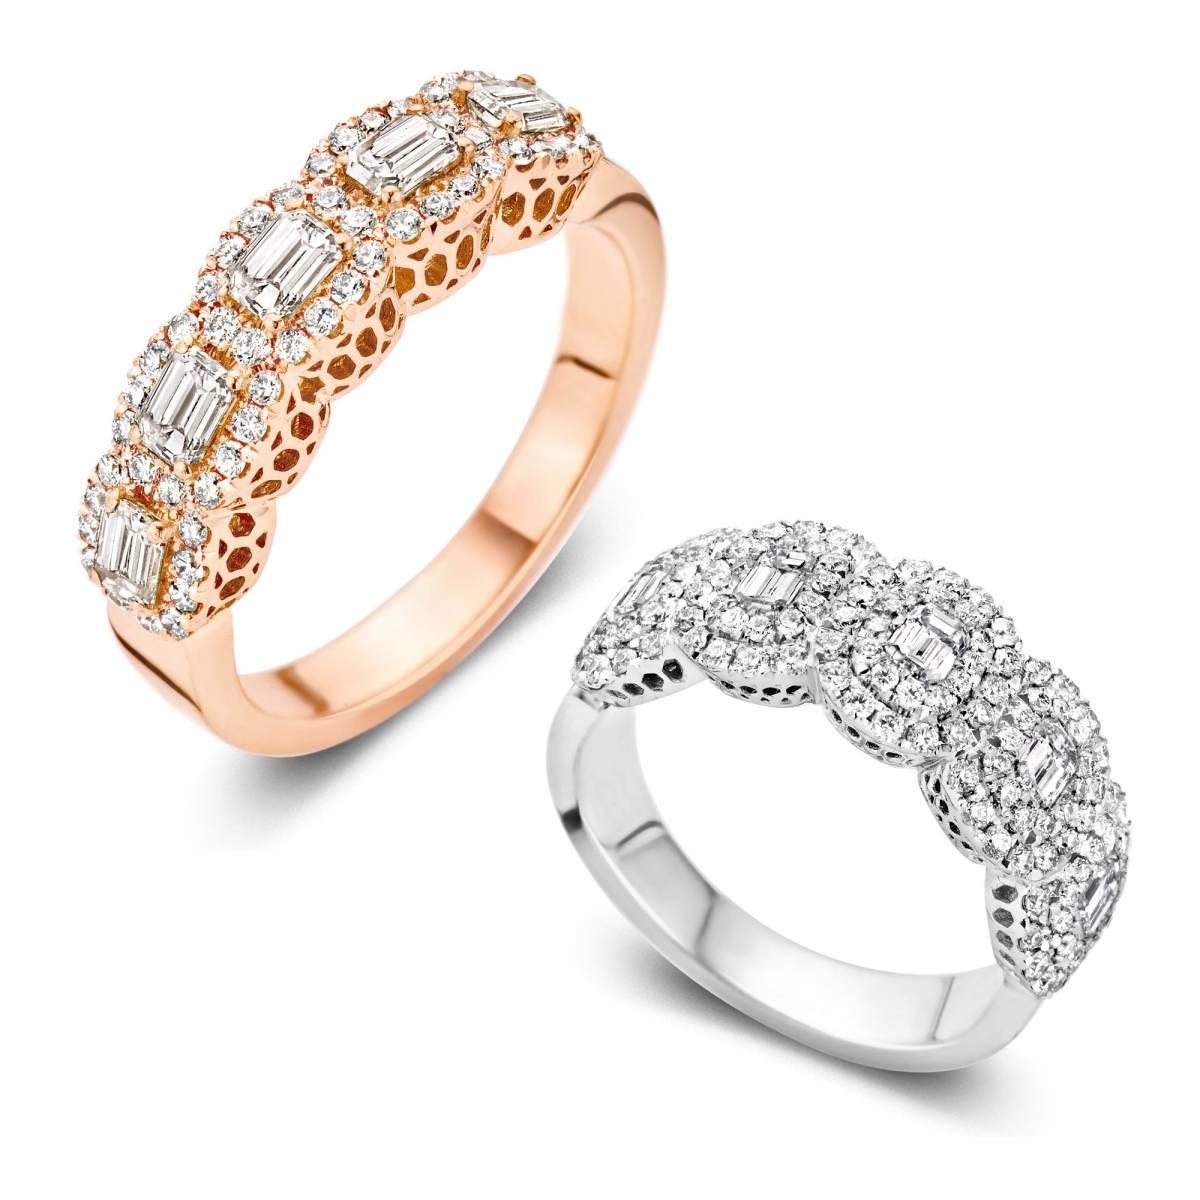 Juwelier Vandromme   Juwelen   House of Weddings copy